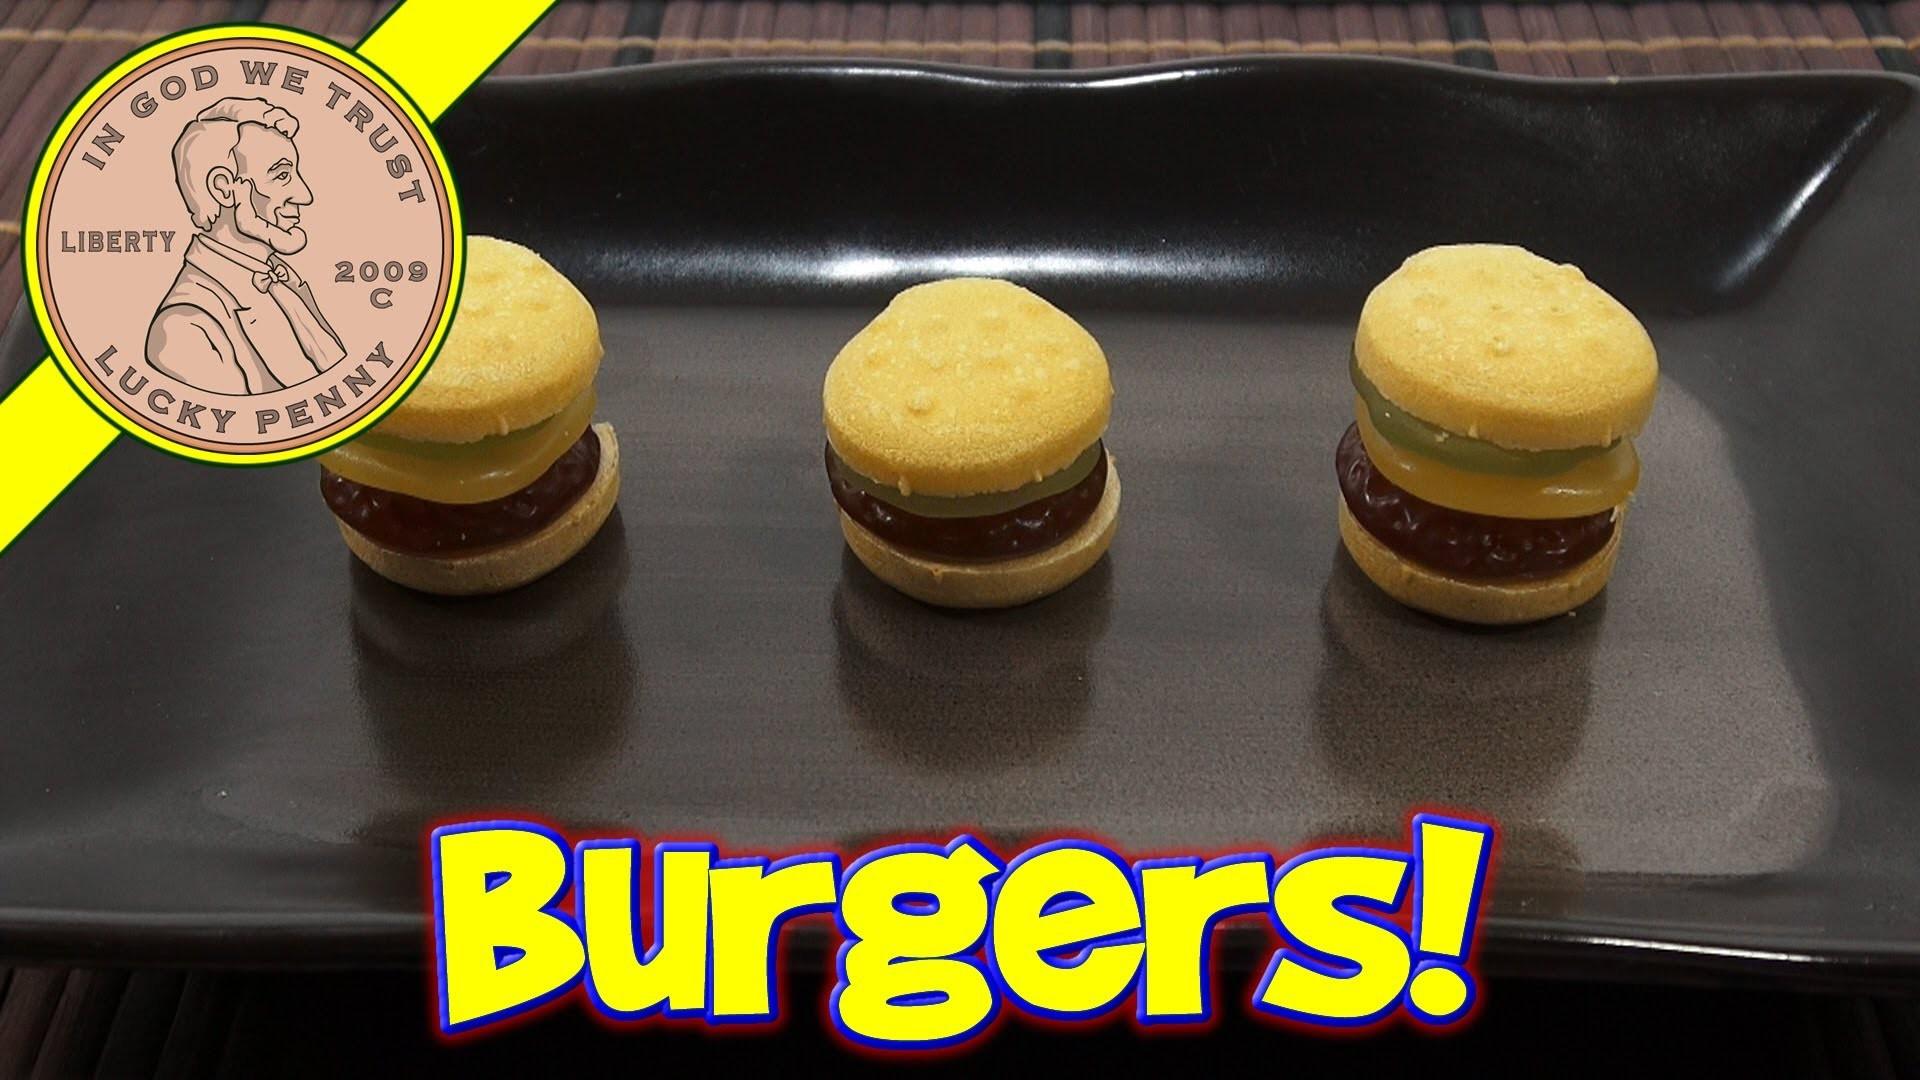 Cheeseburger & Hamburger Gummy DIY Japanese Maker Kit - Meiji Yataiman